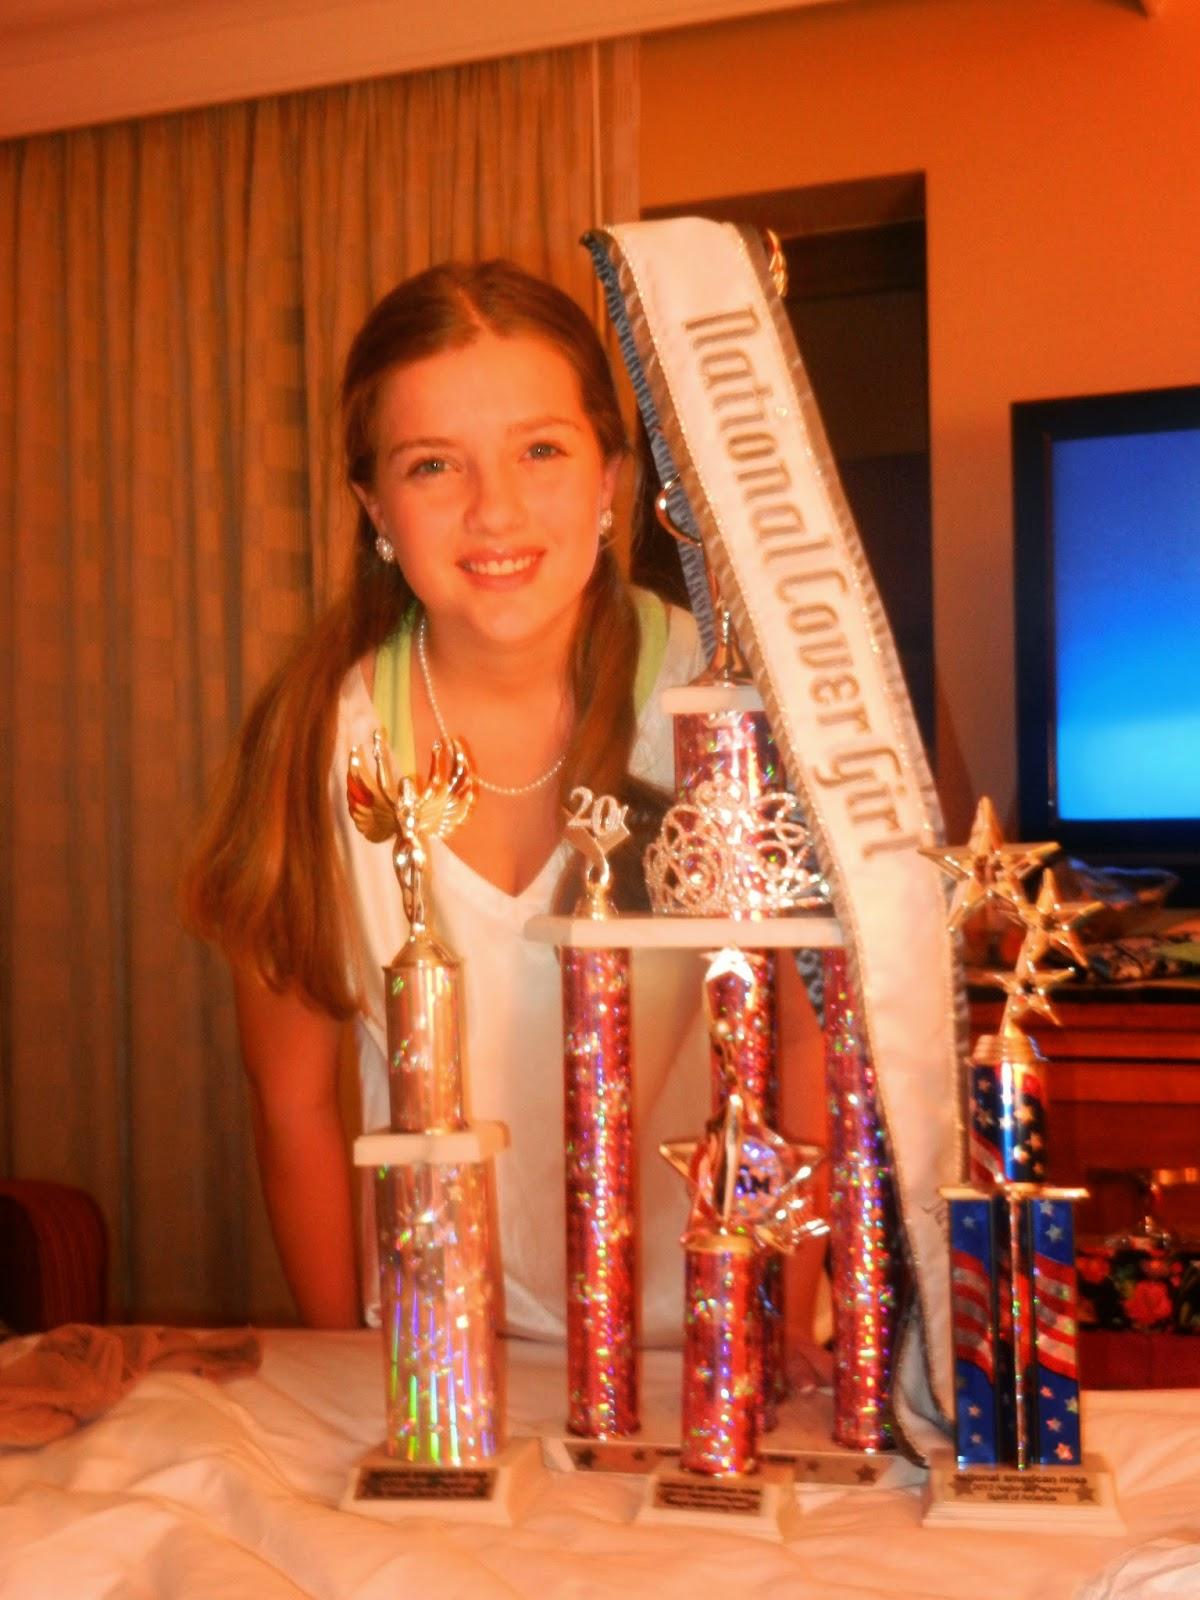 Miss nam national american